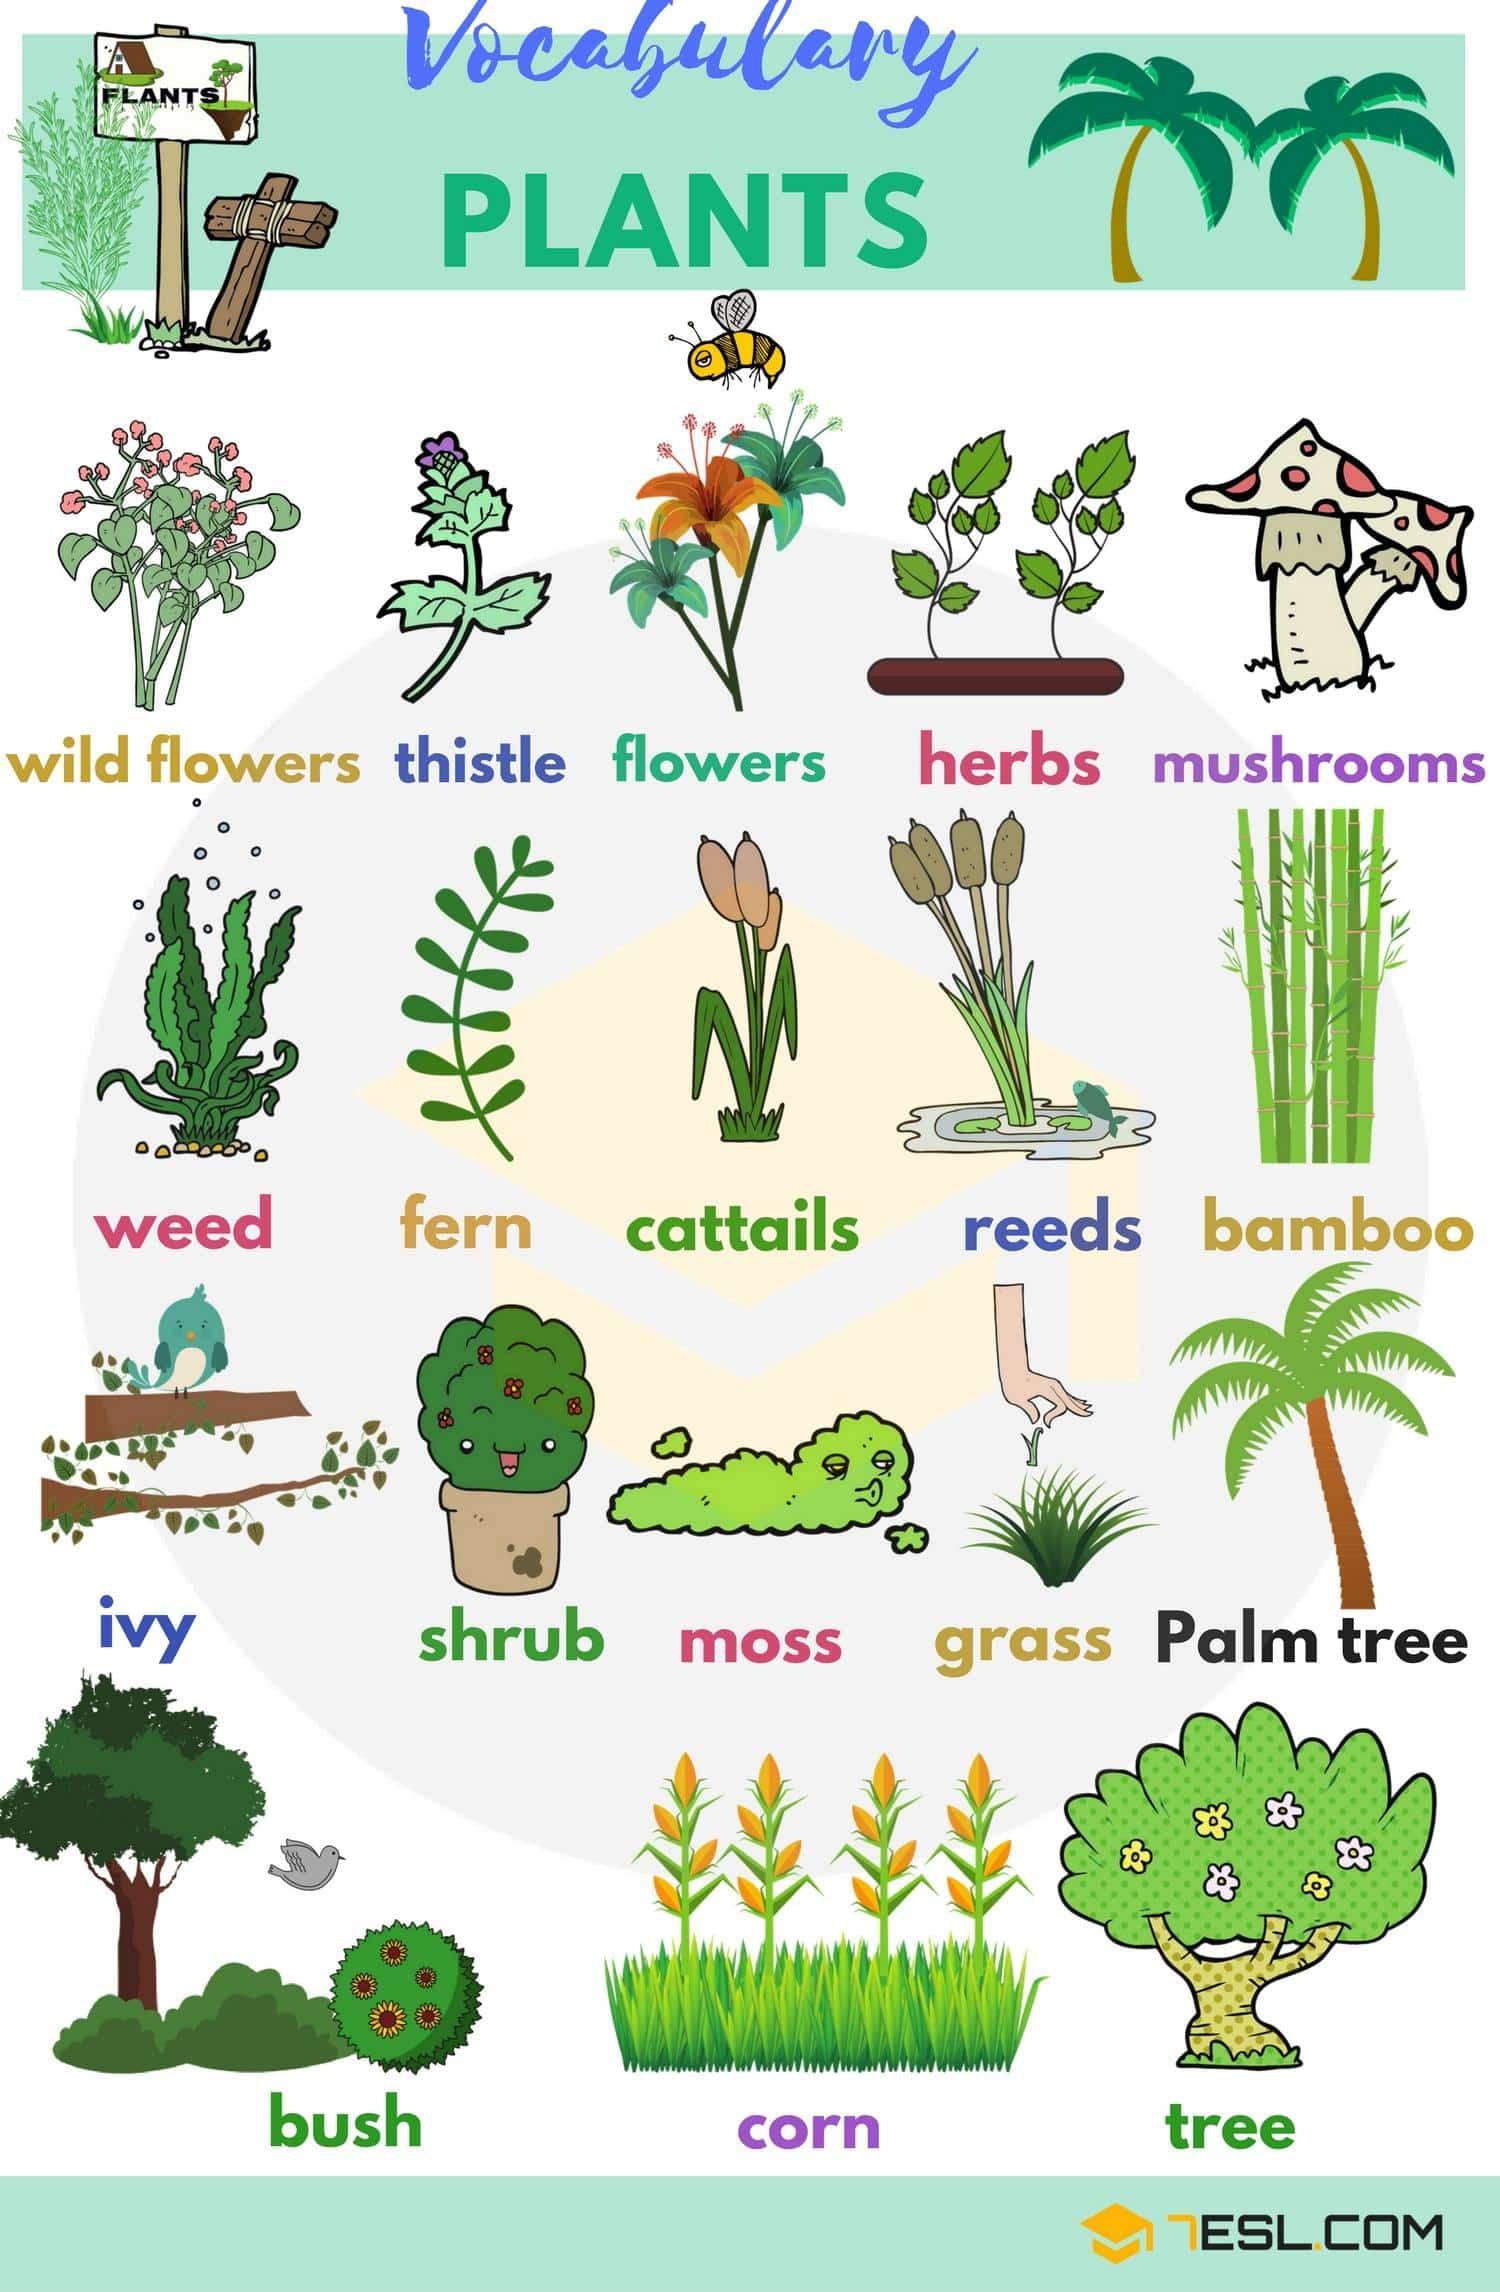 Plants Vocabulary